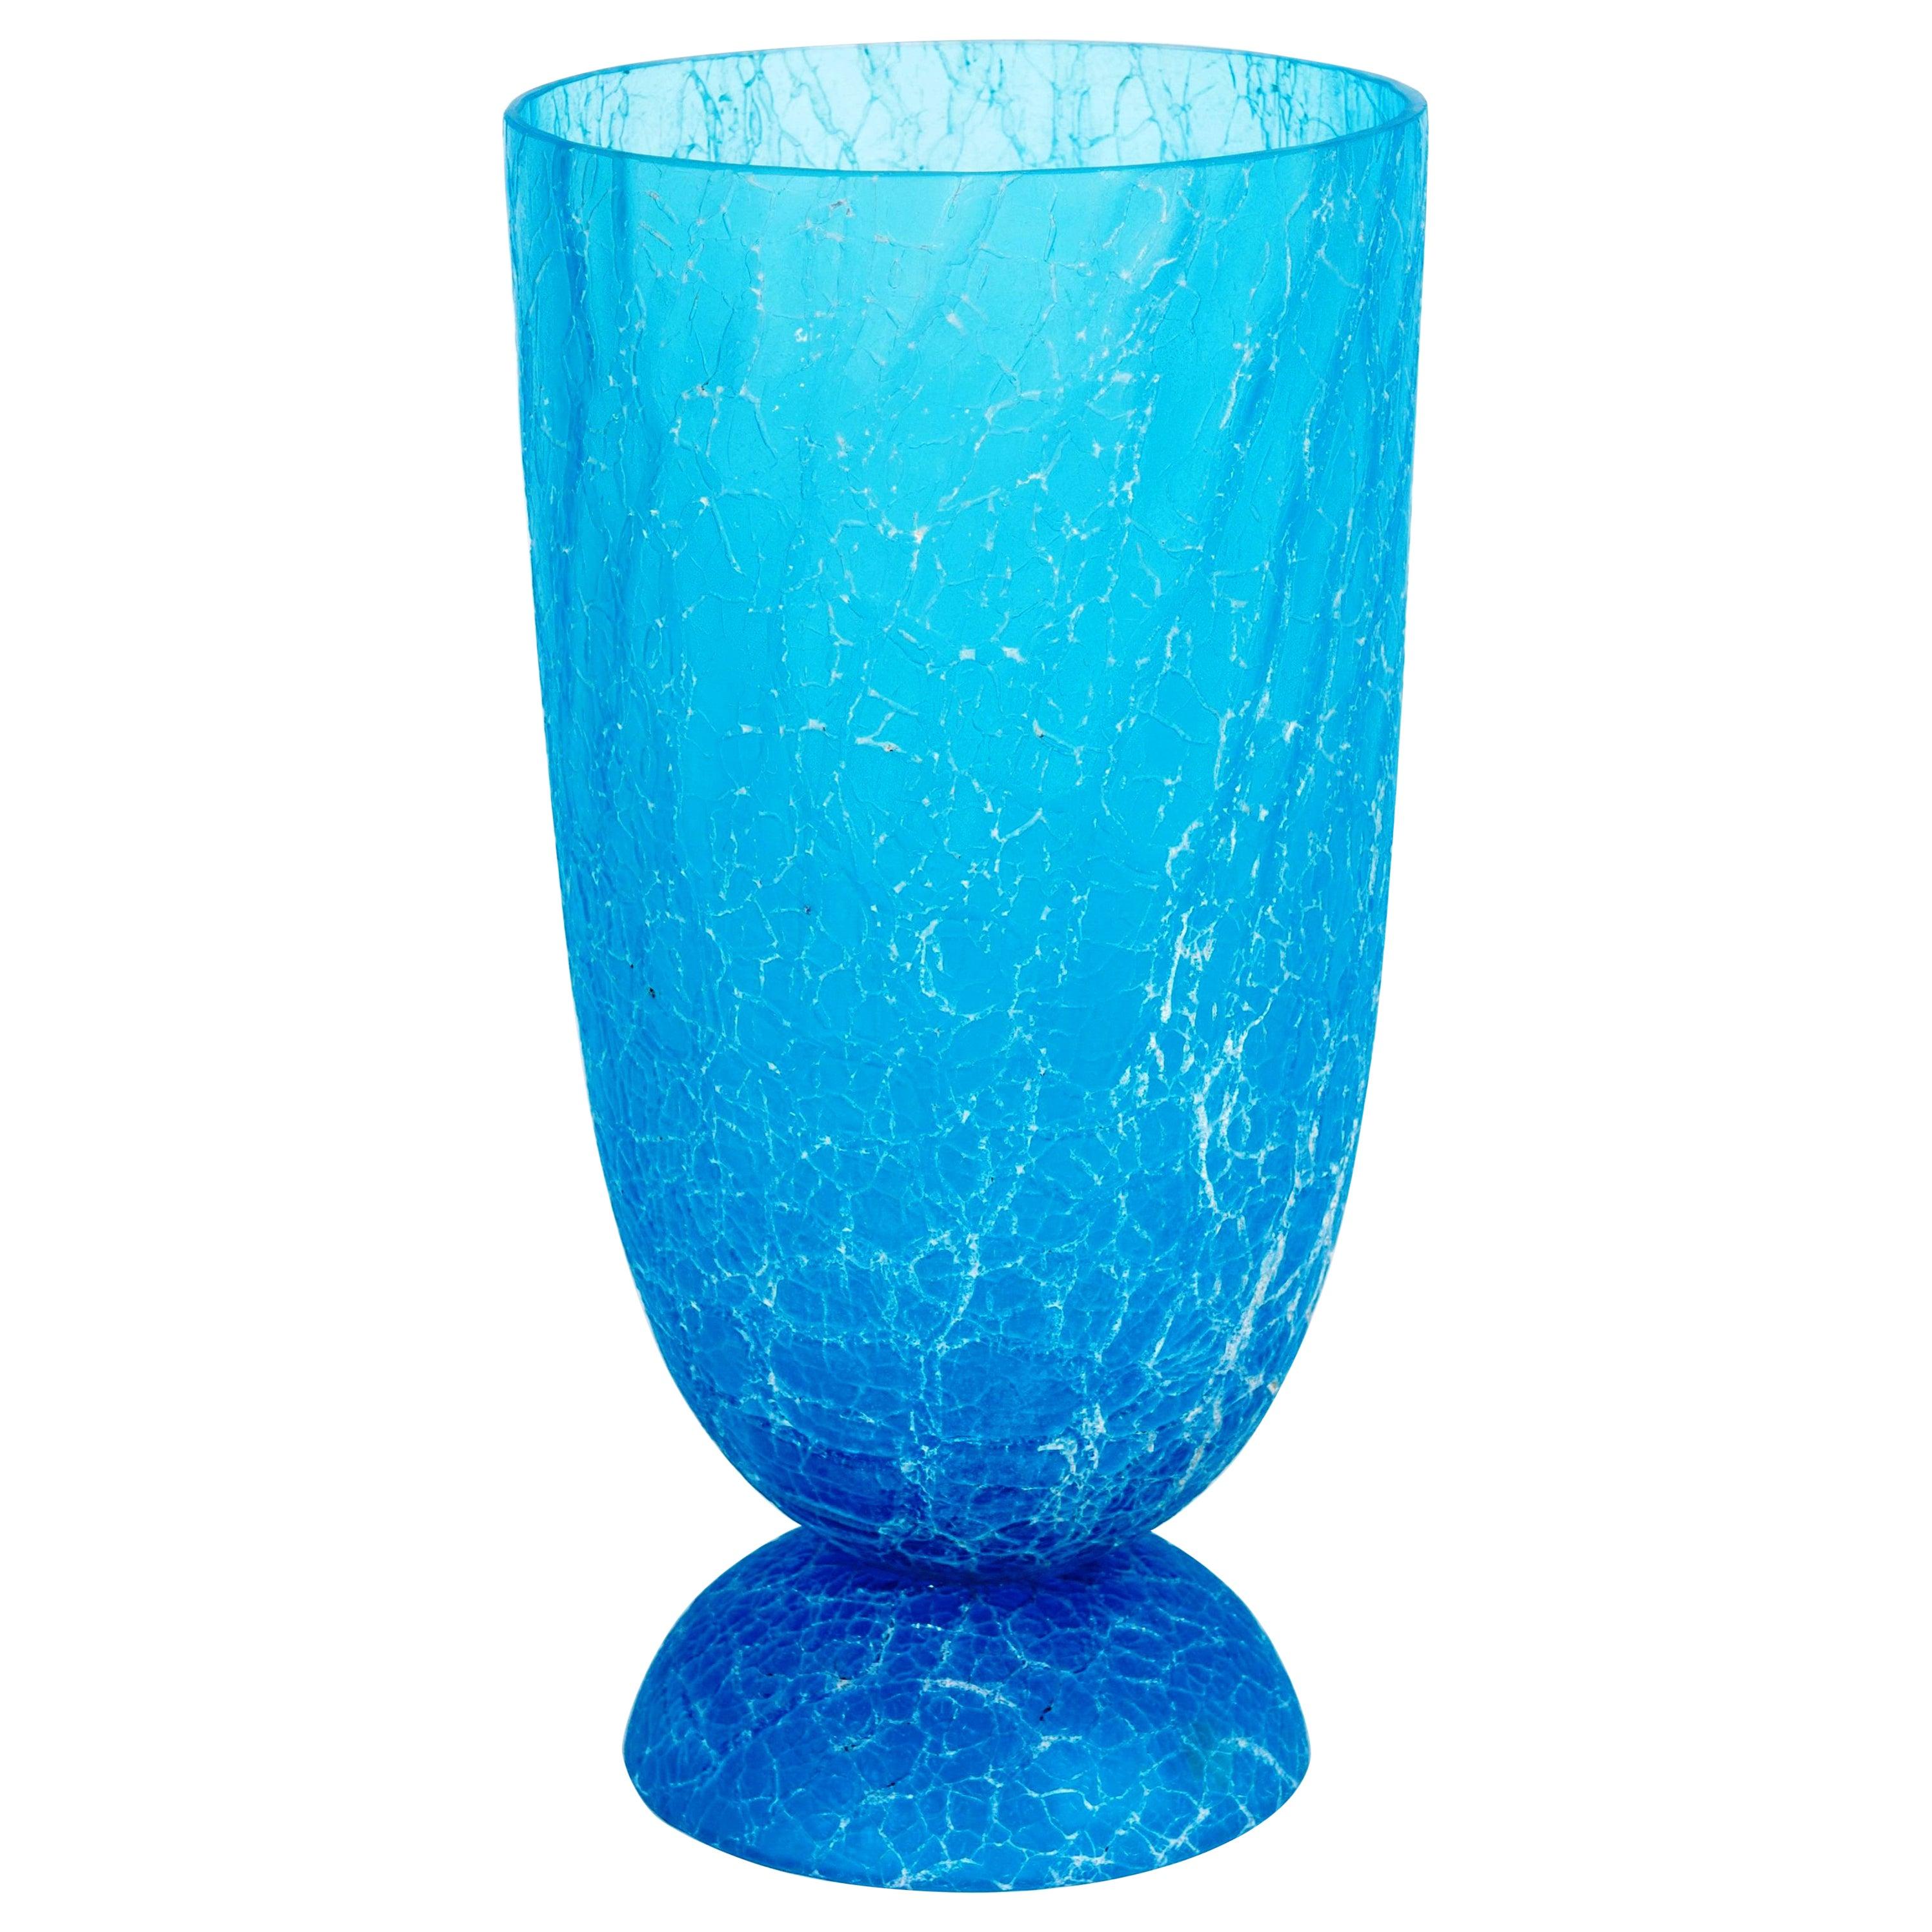 Italian Light Blue Vase with Cracks Blown Murano Glass, Signed Cenedese, 1970s